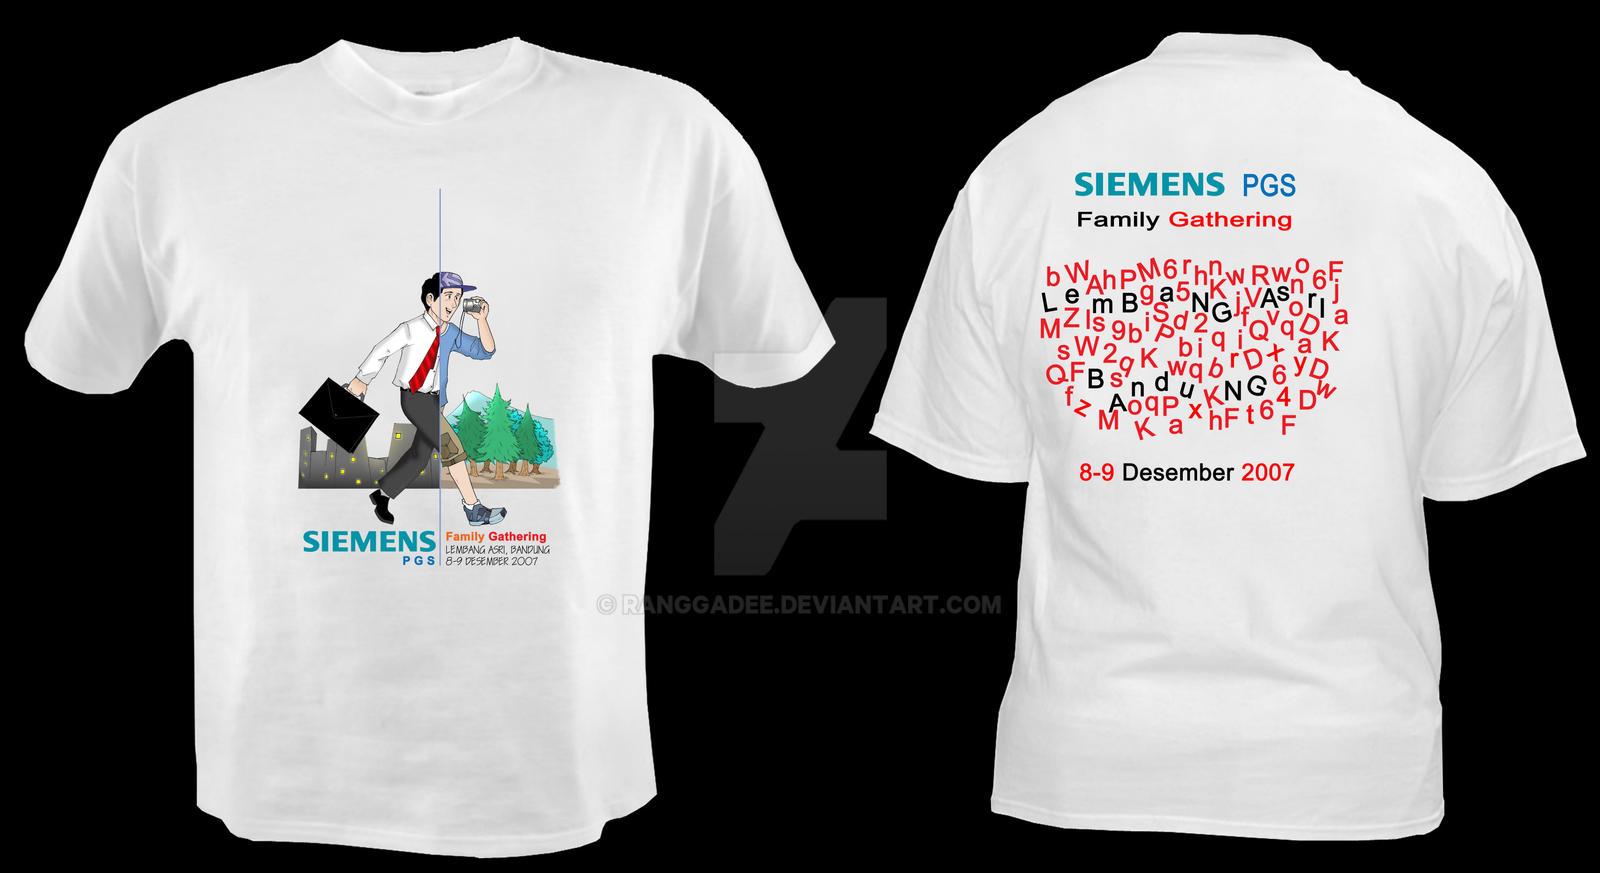 Design t shirt family gathering -  T Shirt Design Ver 2 By Ranggadee